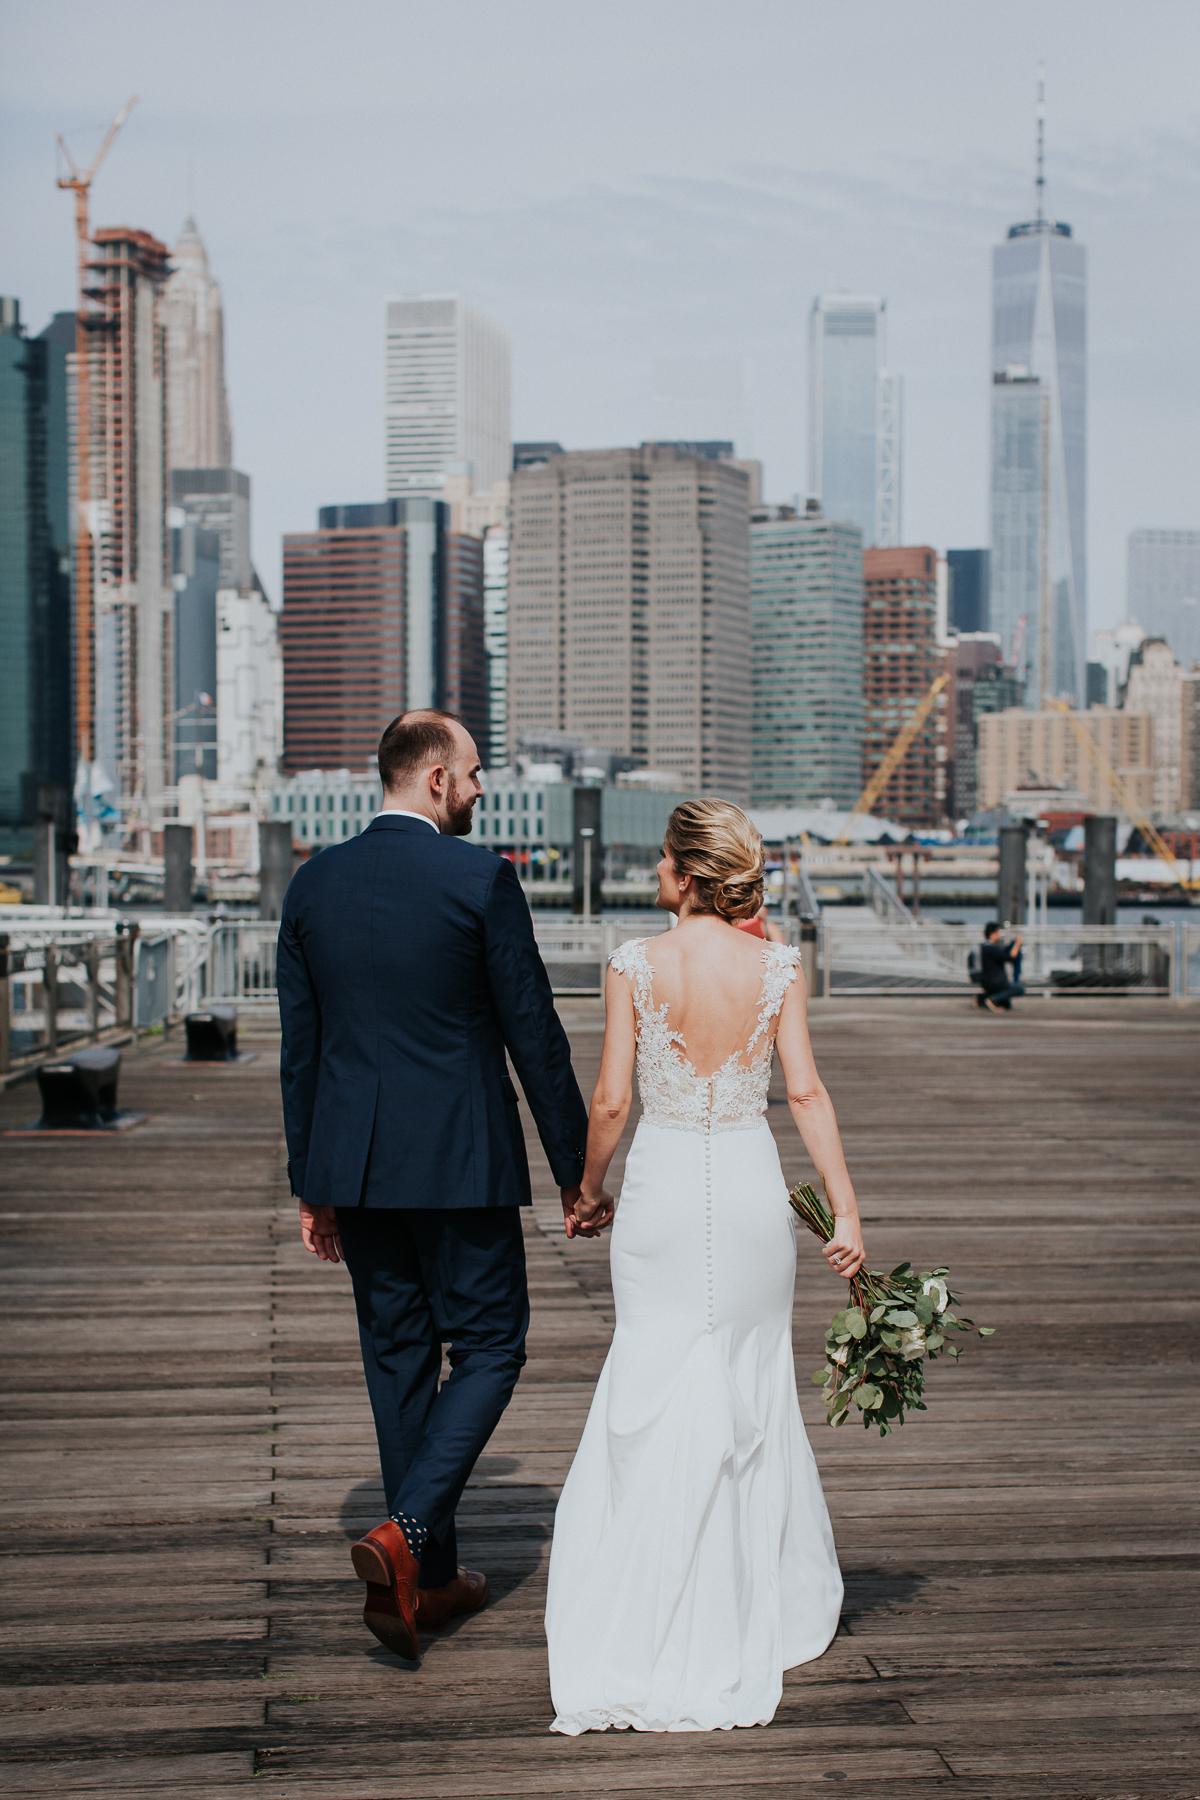 Frankies-457-Spuntino-Intimate-Brooklyn-Restaurant-Wedding-Photographer-26.jpg